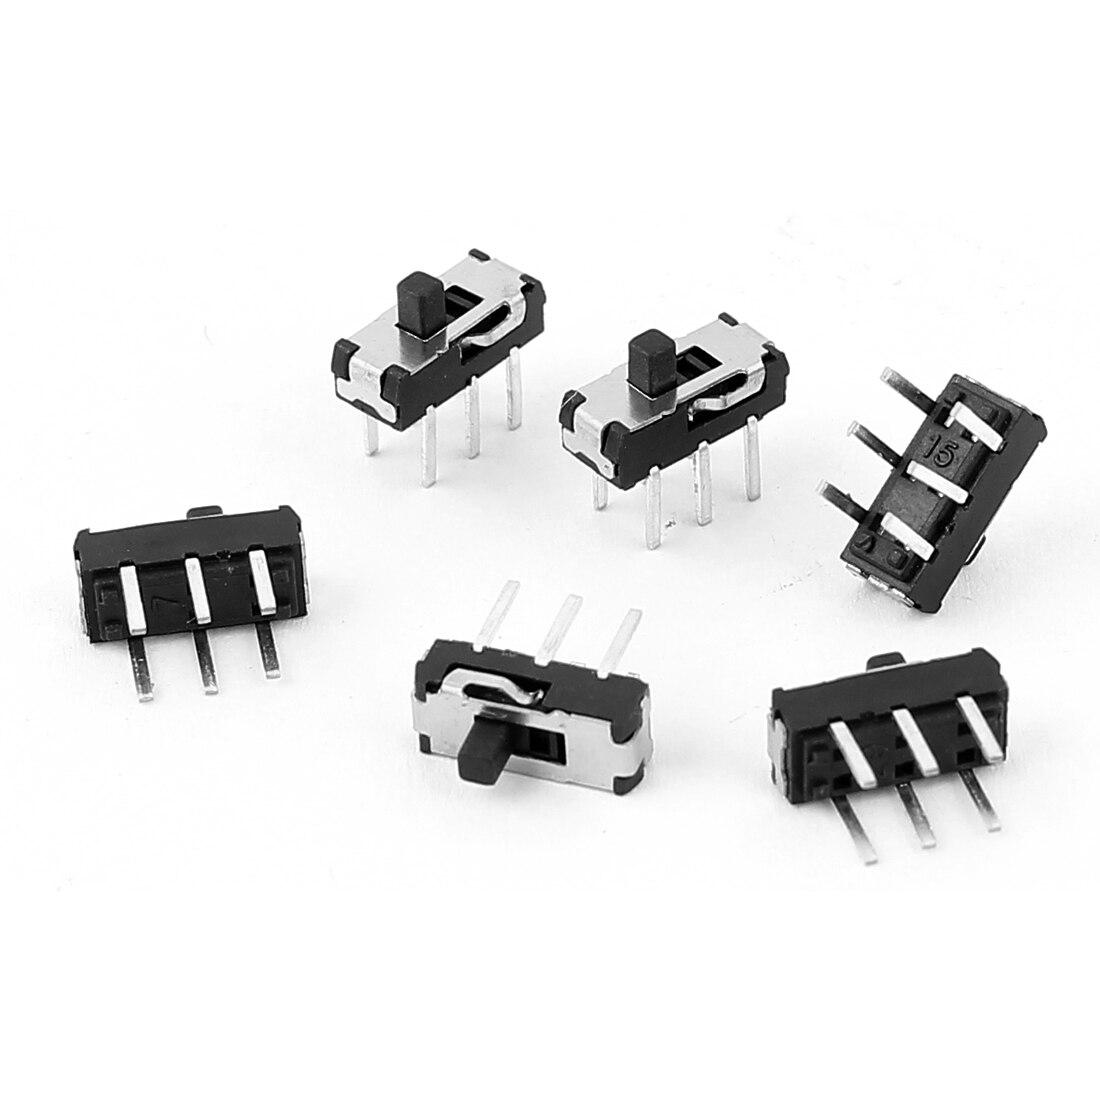 uxcell 5 Pcs On//Off//On 3 Position DPDT 2P3T PCB Panel Slide Switch 6A//125V 3A//250V AC